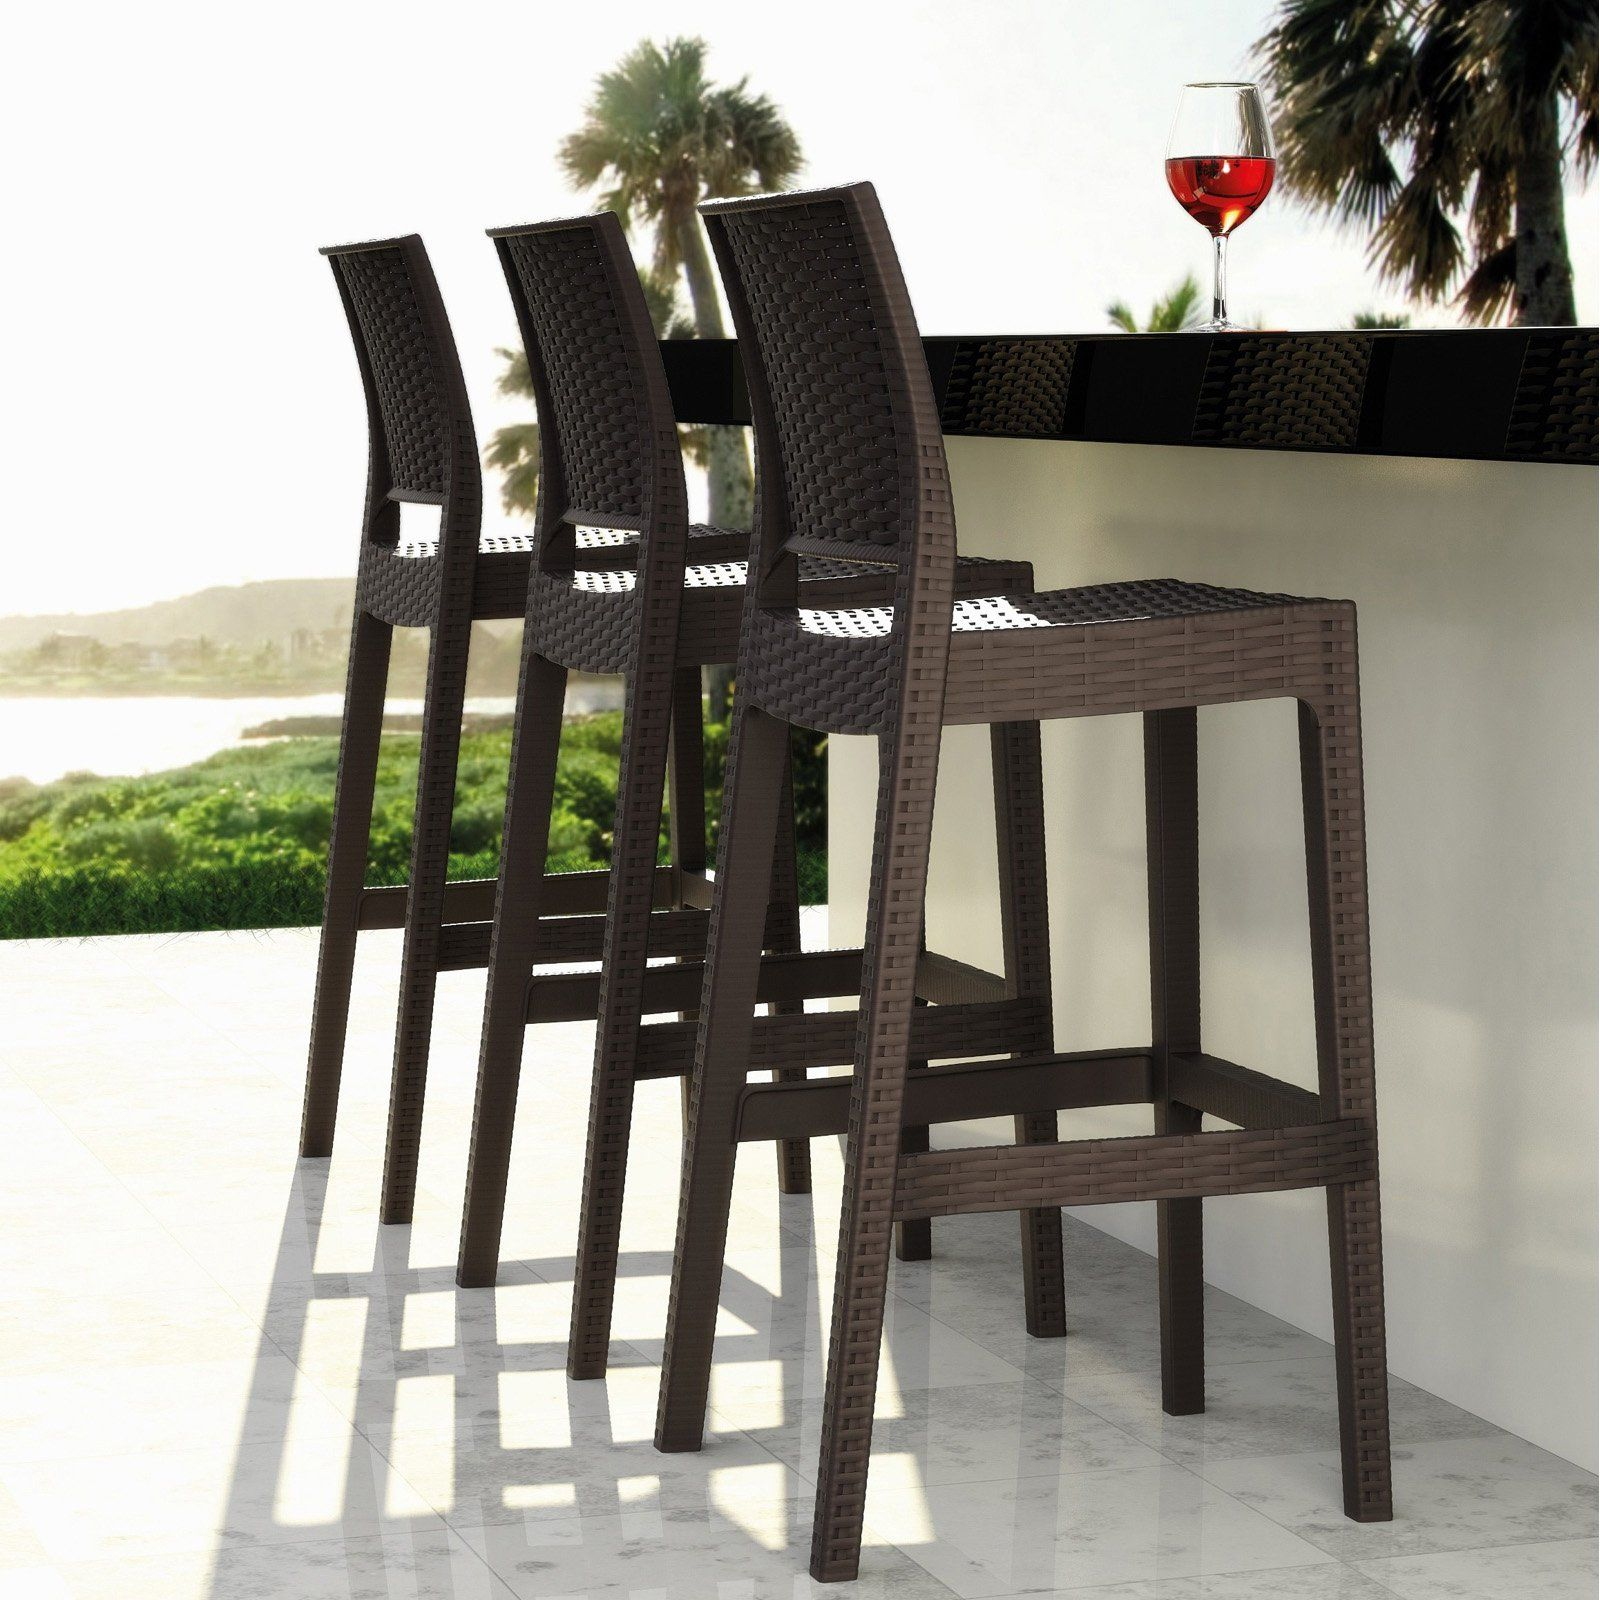 Compamia Jamaica Resin Wicker Barstool With Optional Cushion Set